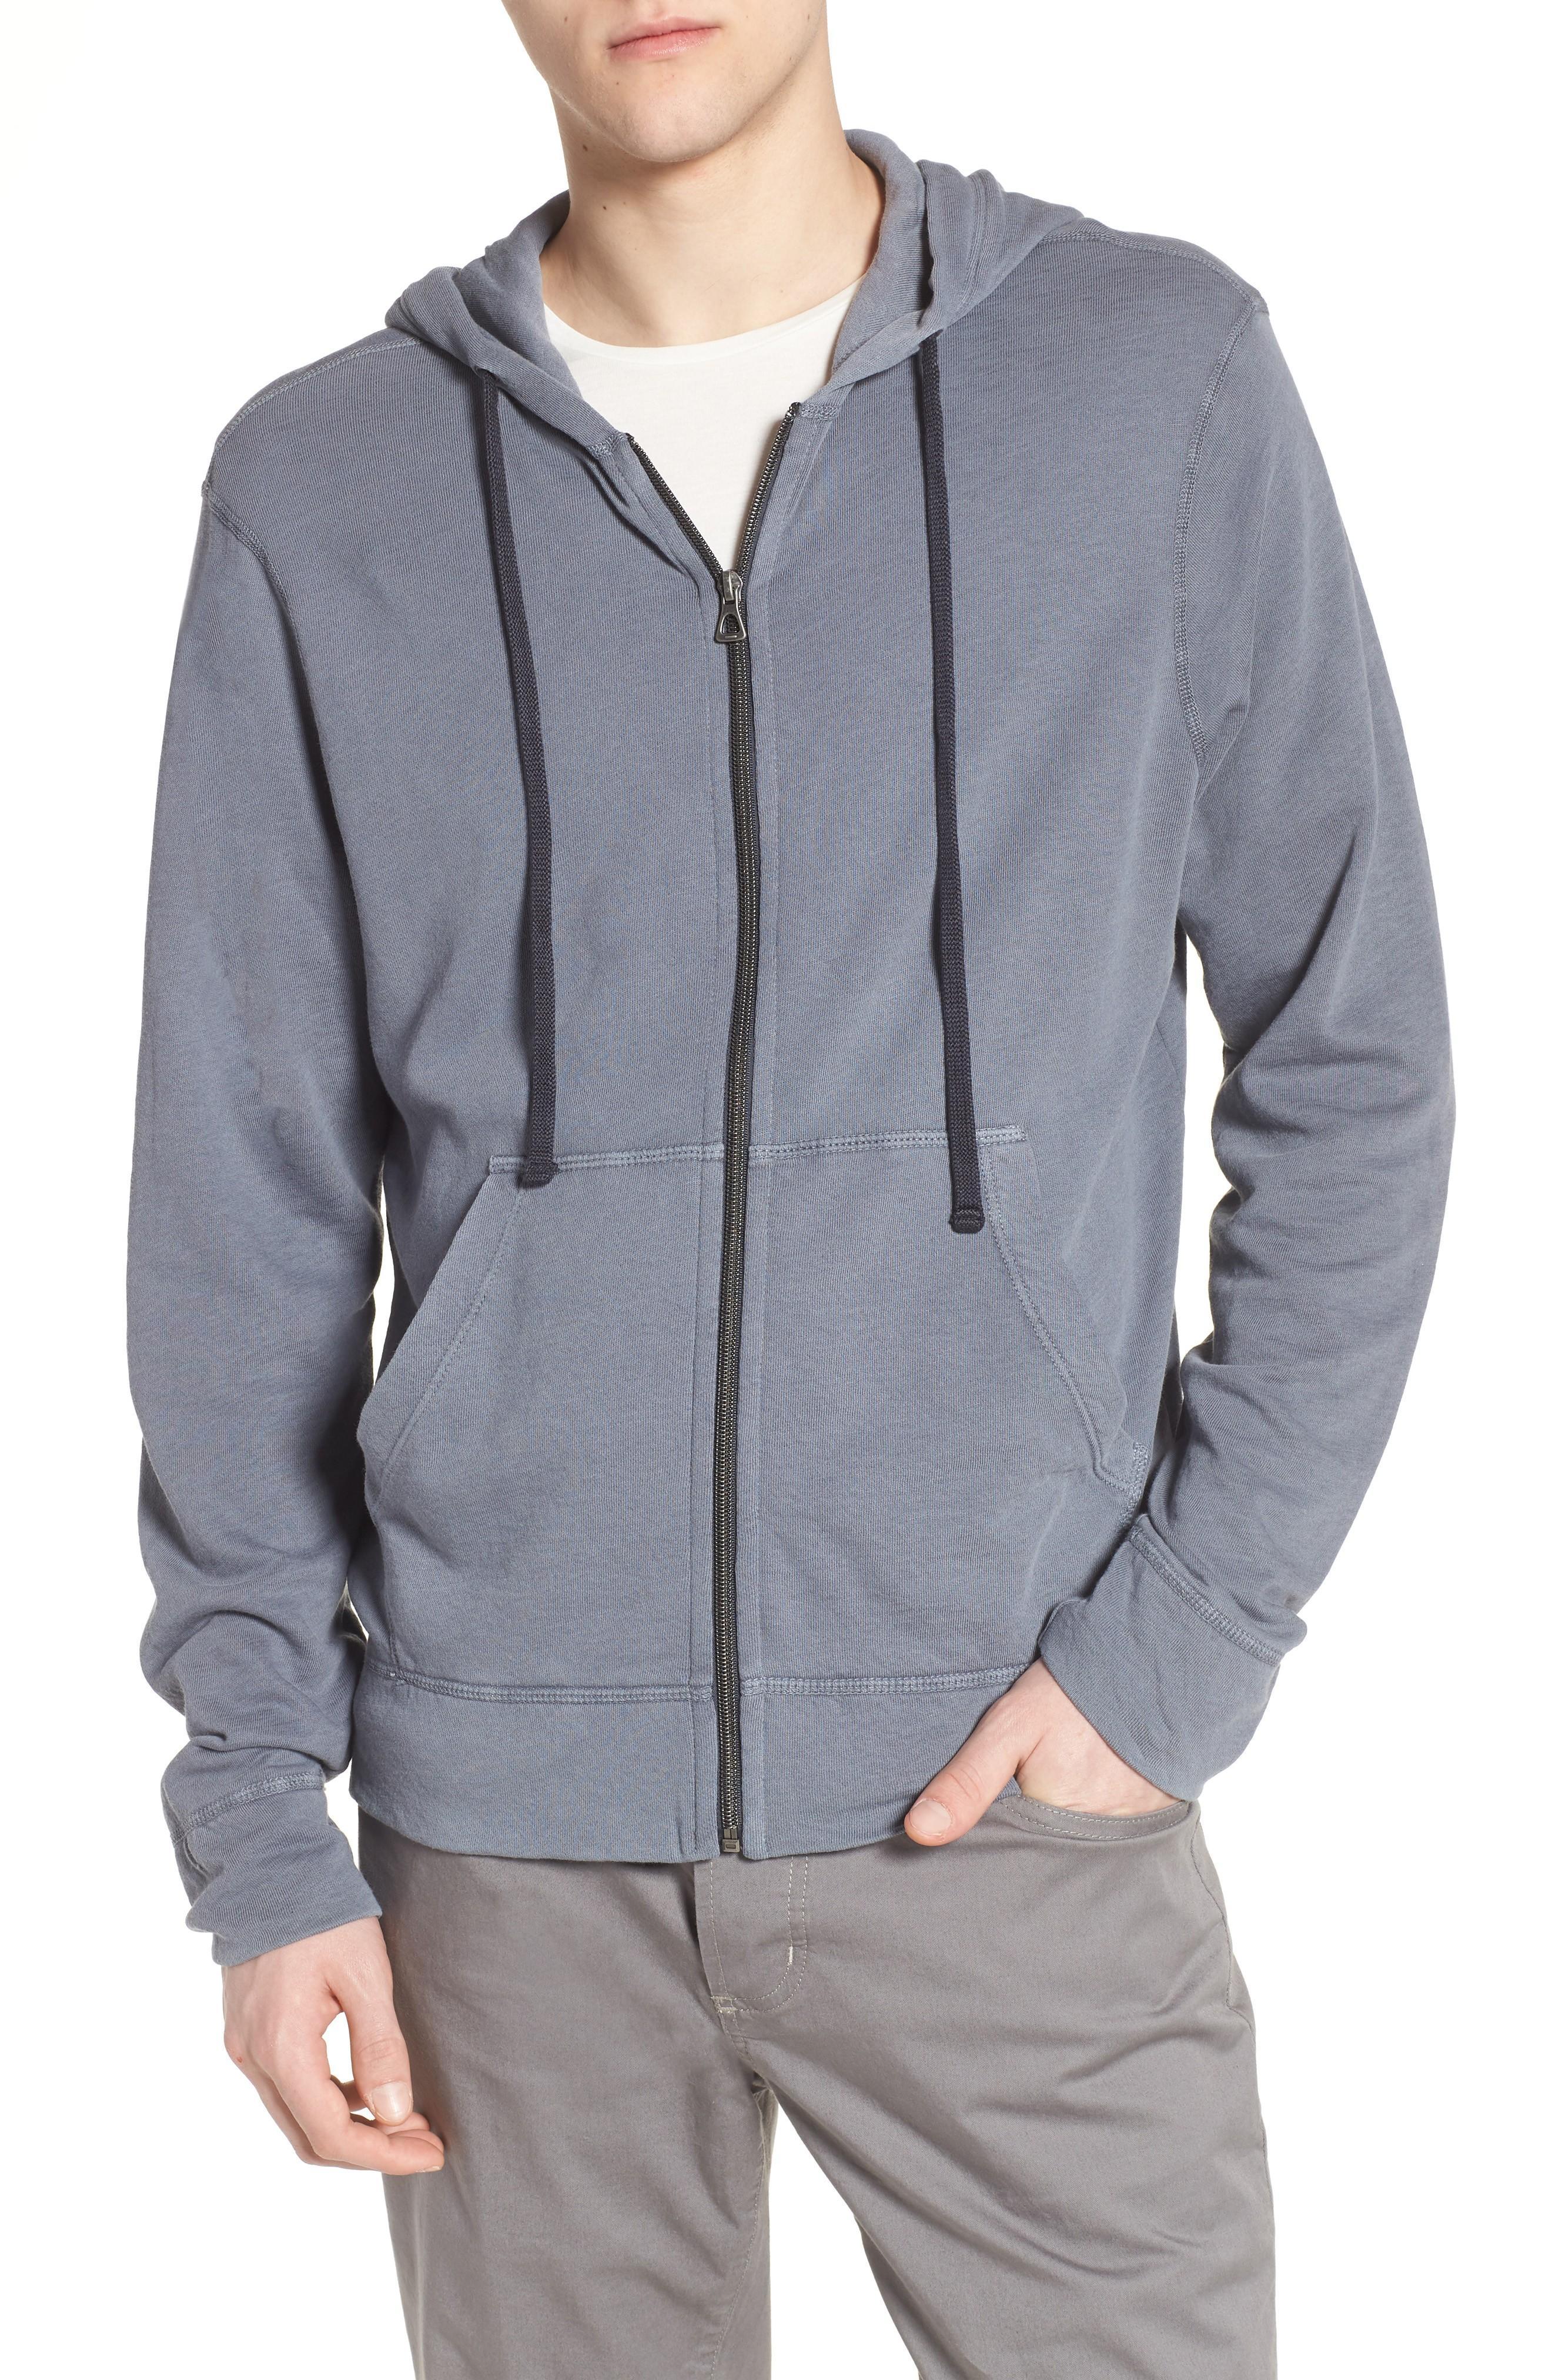 James Perse Classic Zip Hoodie In North Pigment